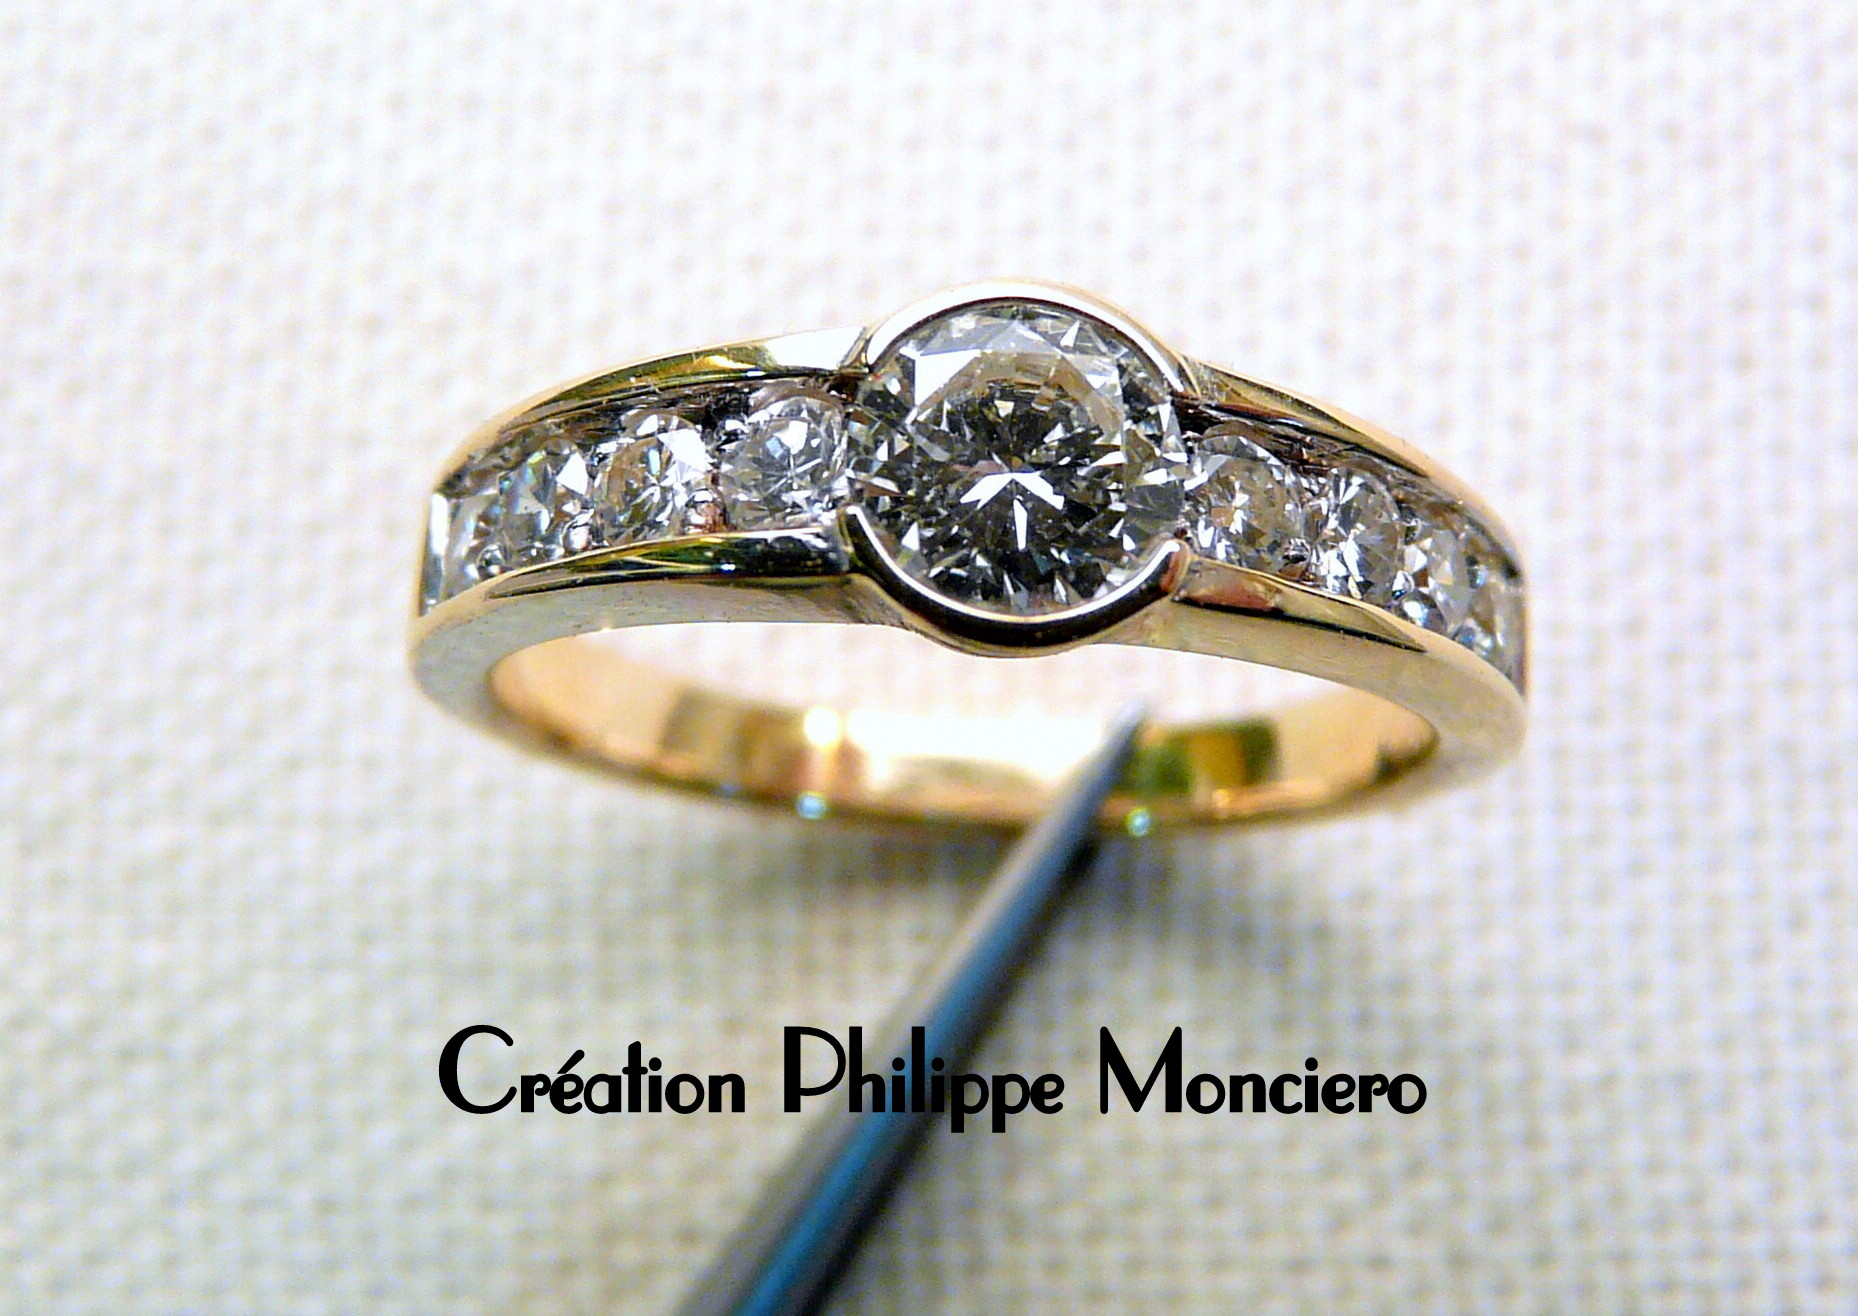 Bague diamants, bicolore. Monciero - Nîmes